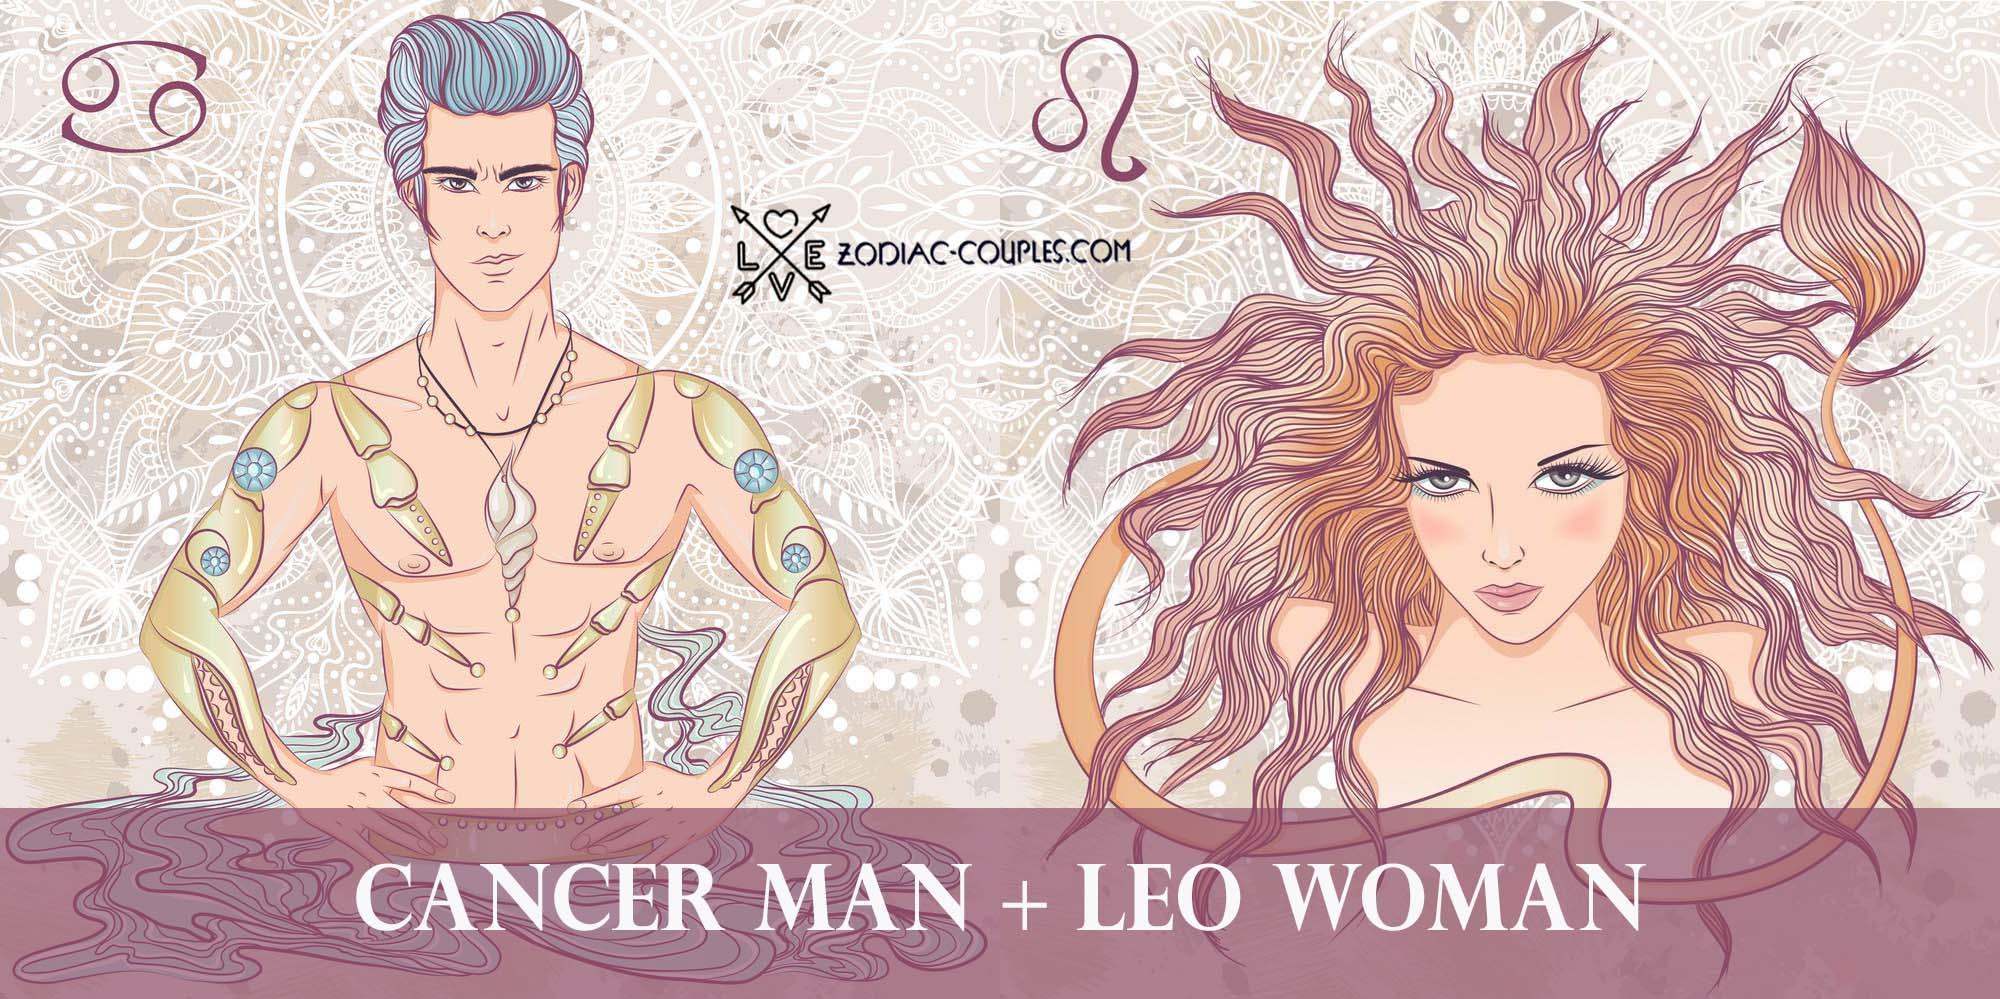 Woman break sagittarius man up leo Leo Woman